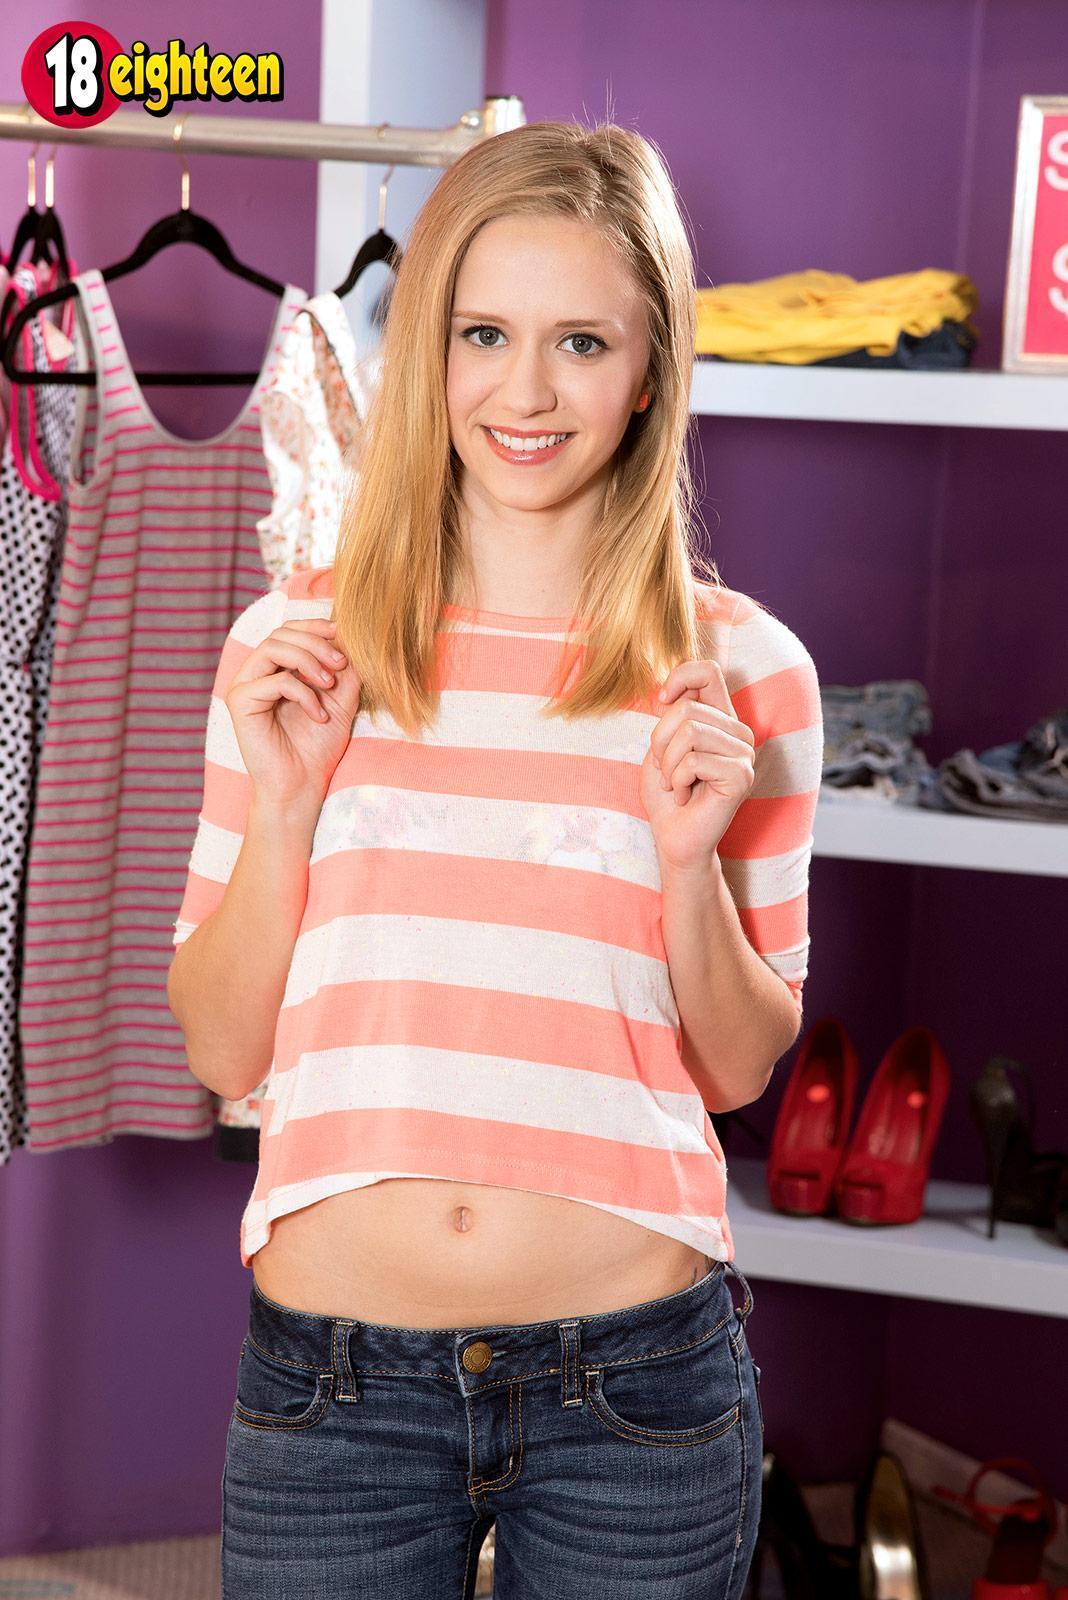 Amateur teen Rachel James baring diminutive tits for nipple gobbling before hefty boner BLOW JOB